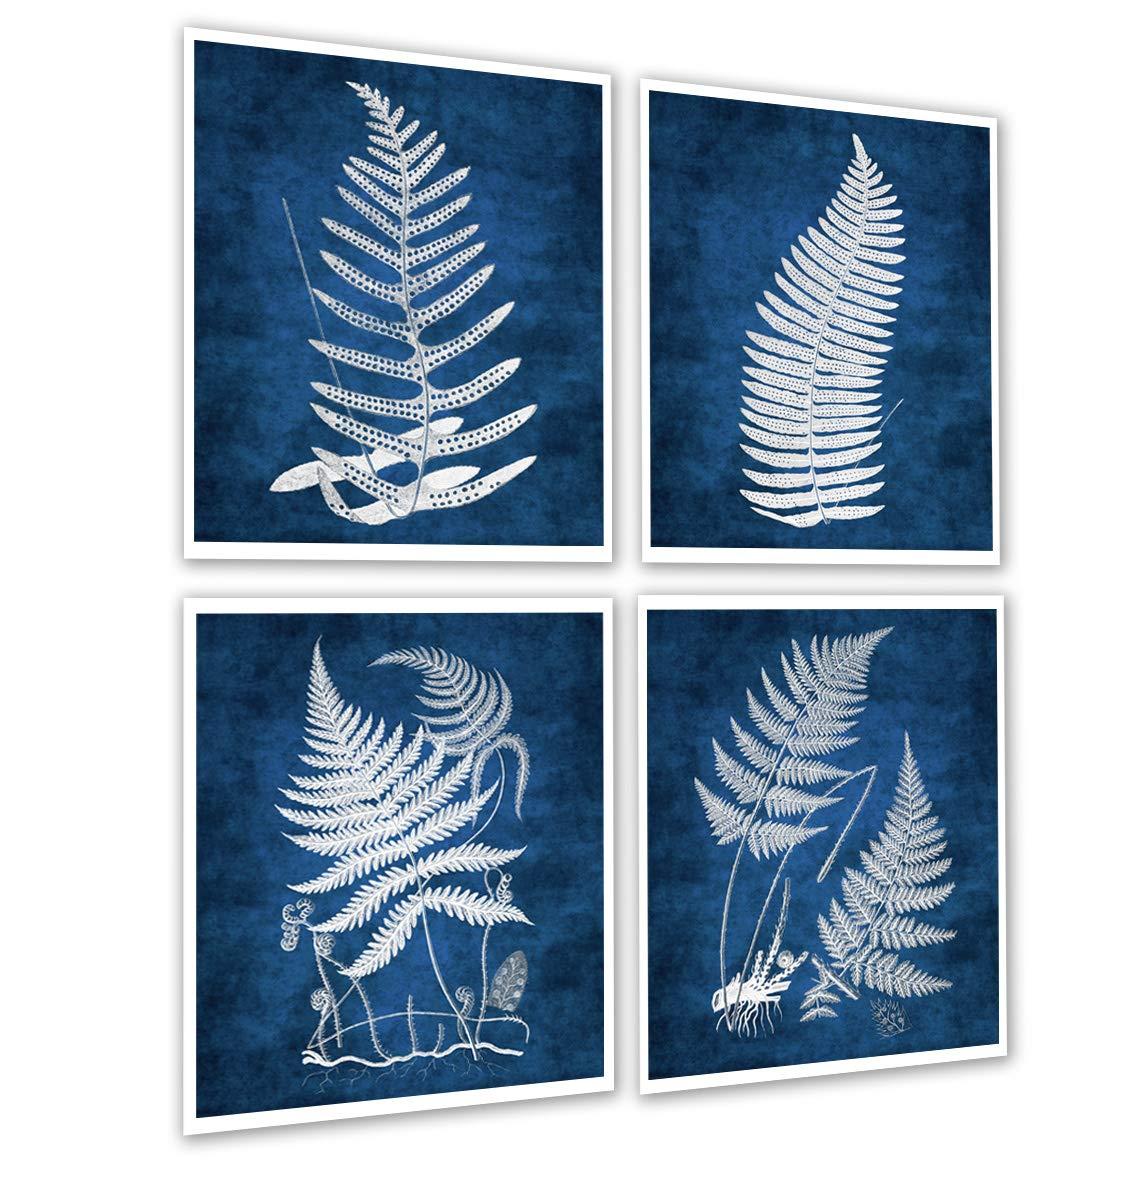 Amazon com gnosis picture archive navy blue fern wall decor print set of 4 unframed wall art botanical fern prints navy blue background